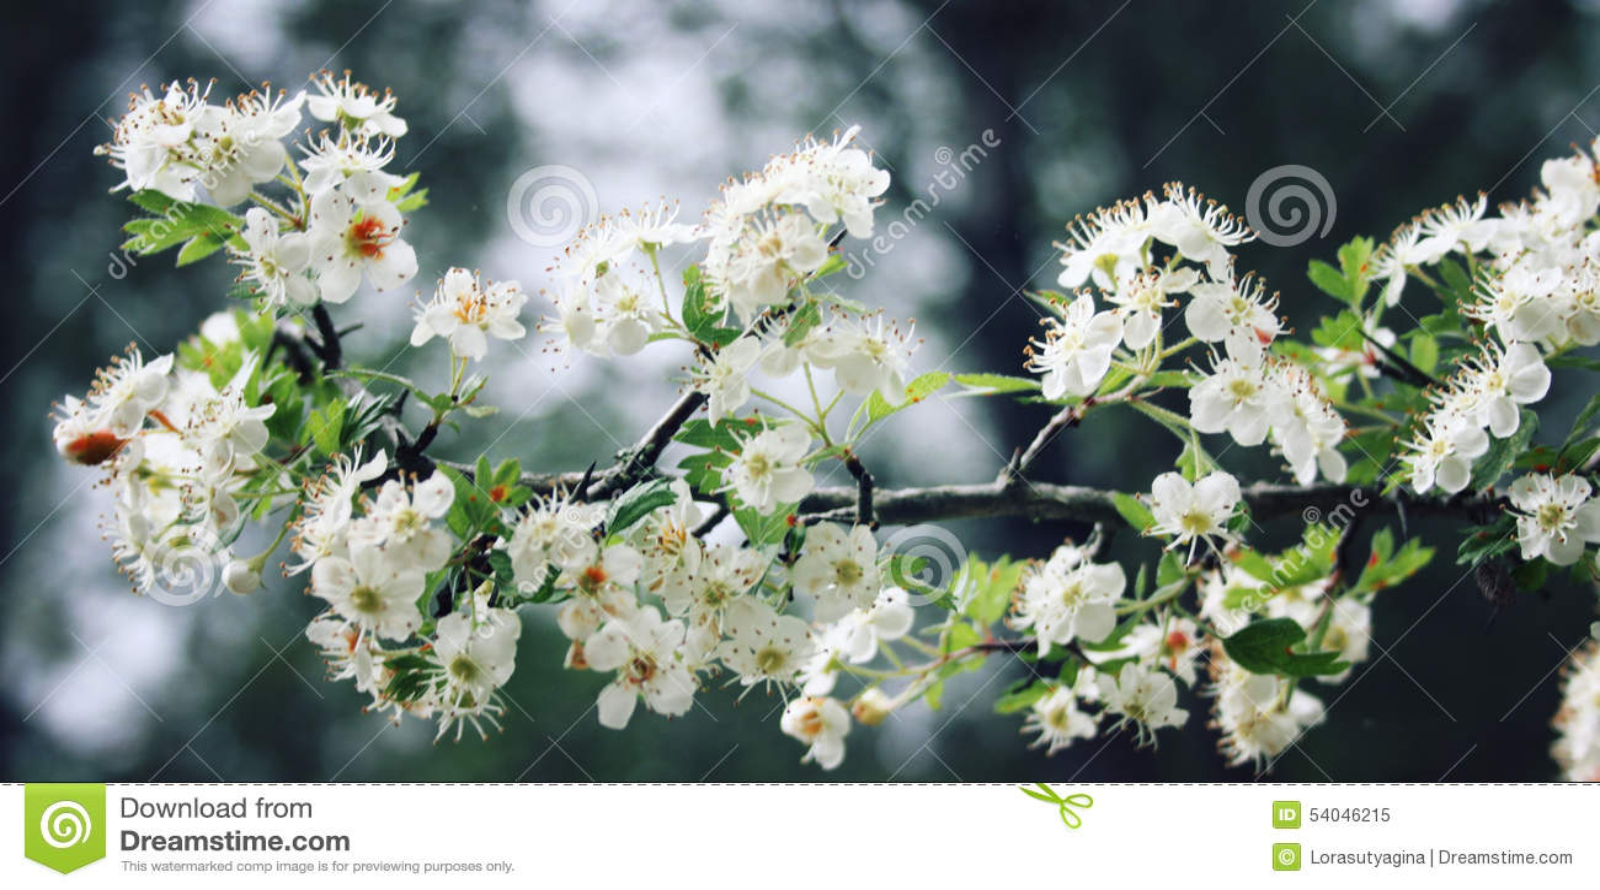 Hawthorn tree shrub. White flowers of Hawthorn. Aged photo.